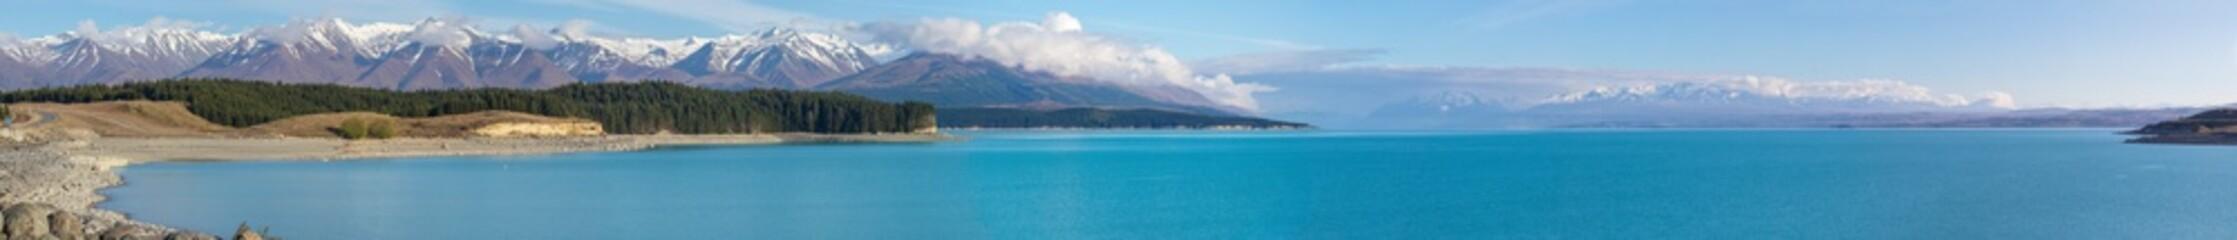 Scenic turquoise Lake Pukaki and Southern Alps panorama, New Zealand